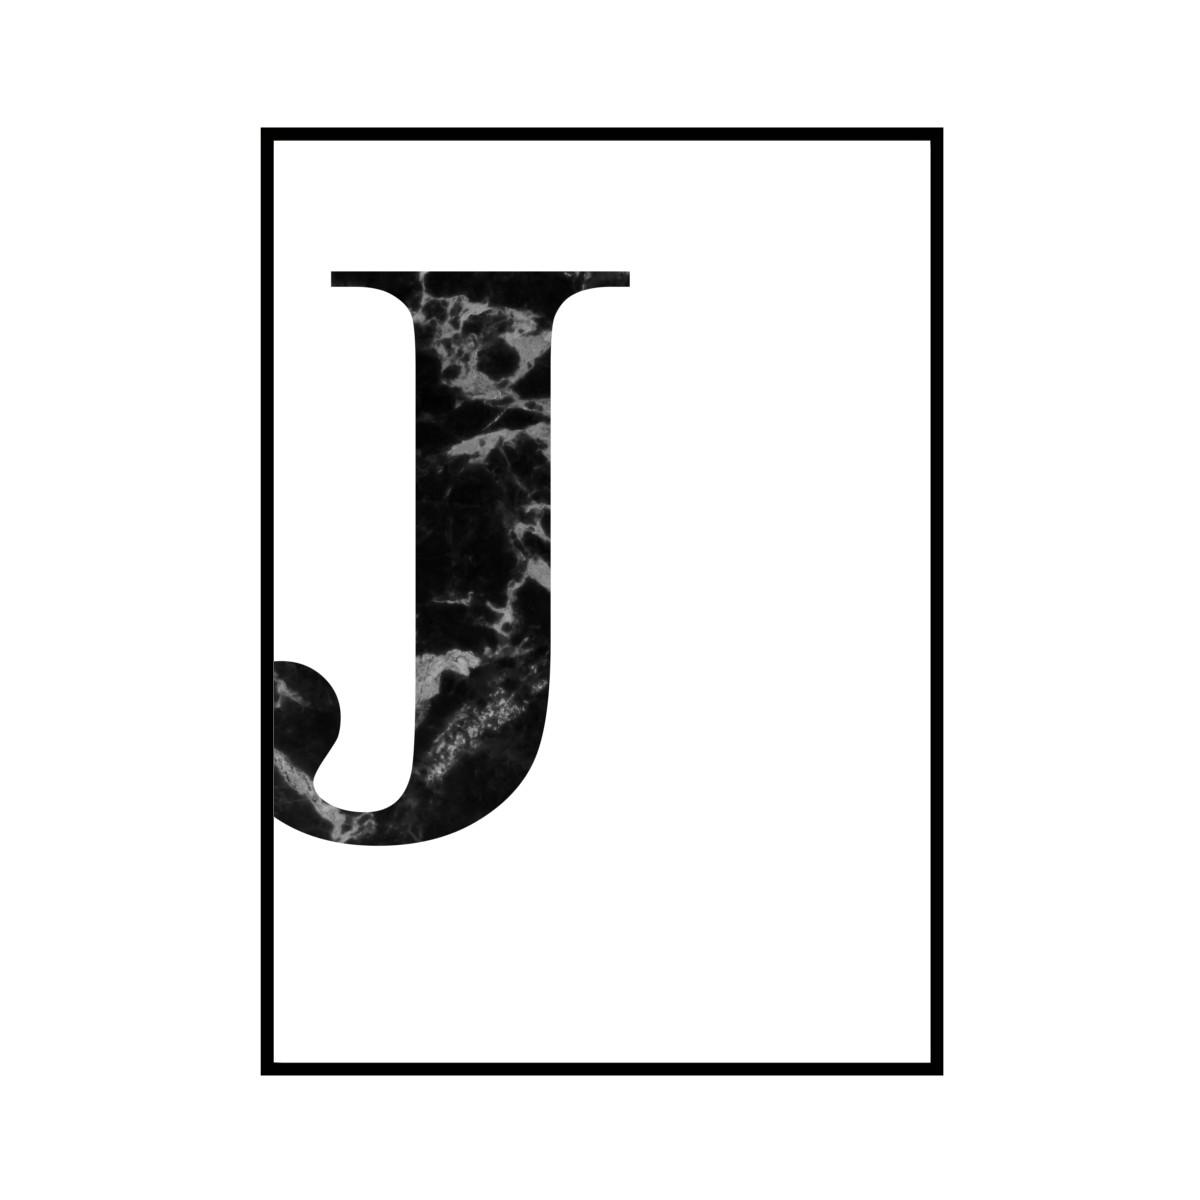 """J"" 黒大理石 - Black marble - ALPHAシリーズ [SD-000511] A1サイズ フレームセット"